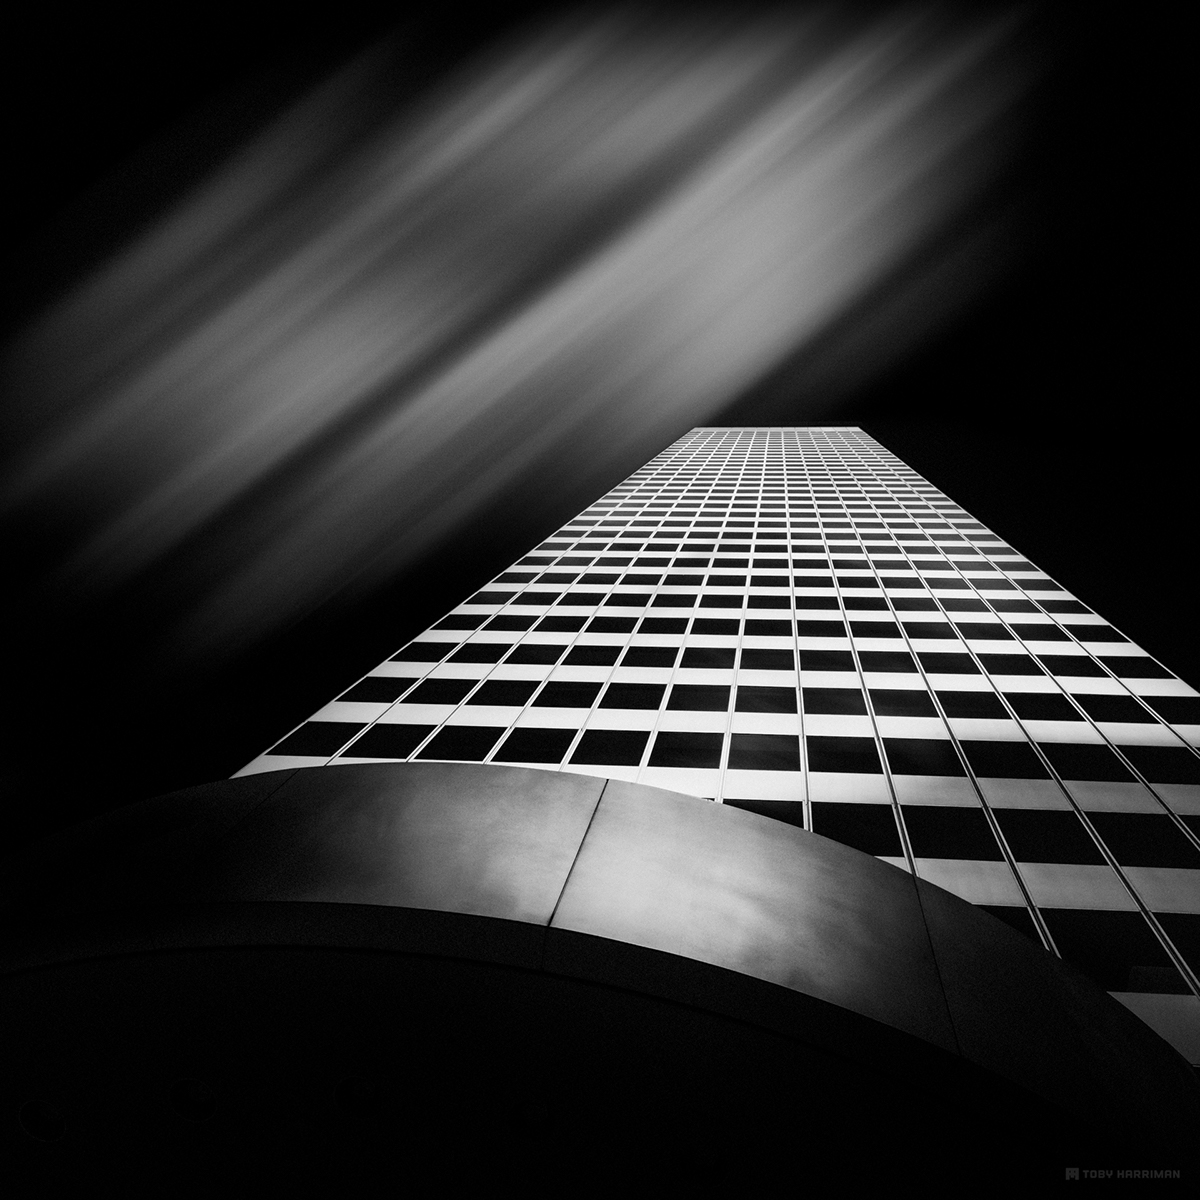 modern,pictures,black and white,Mono,dark,photoshop,Photo Manipulation ,long exposure,artist,art,Original,photos,light,city,buildings